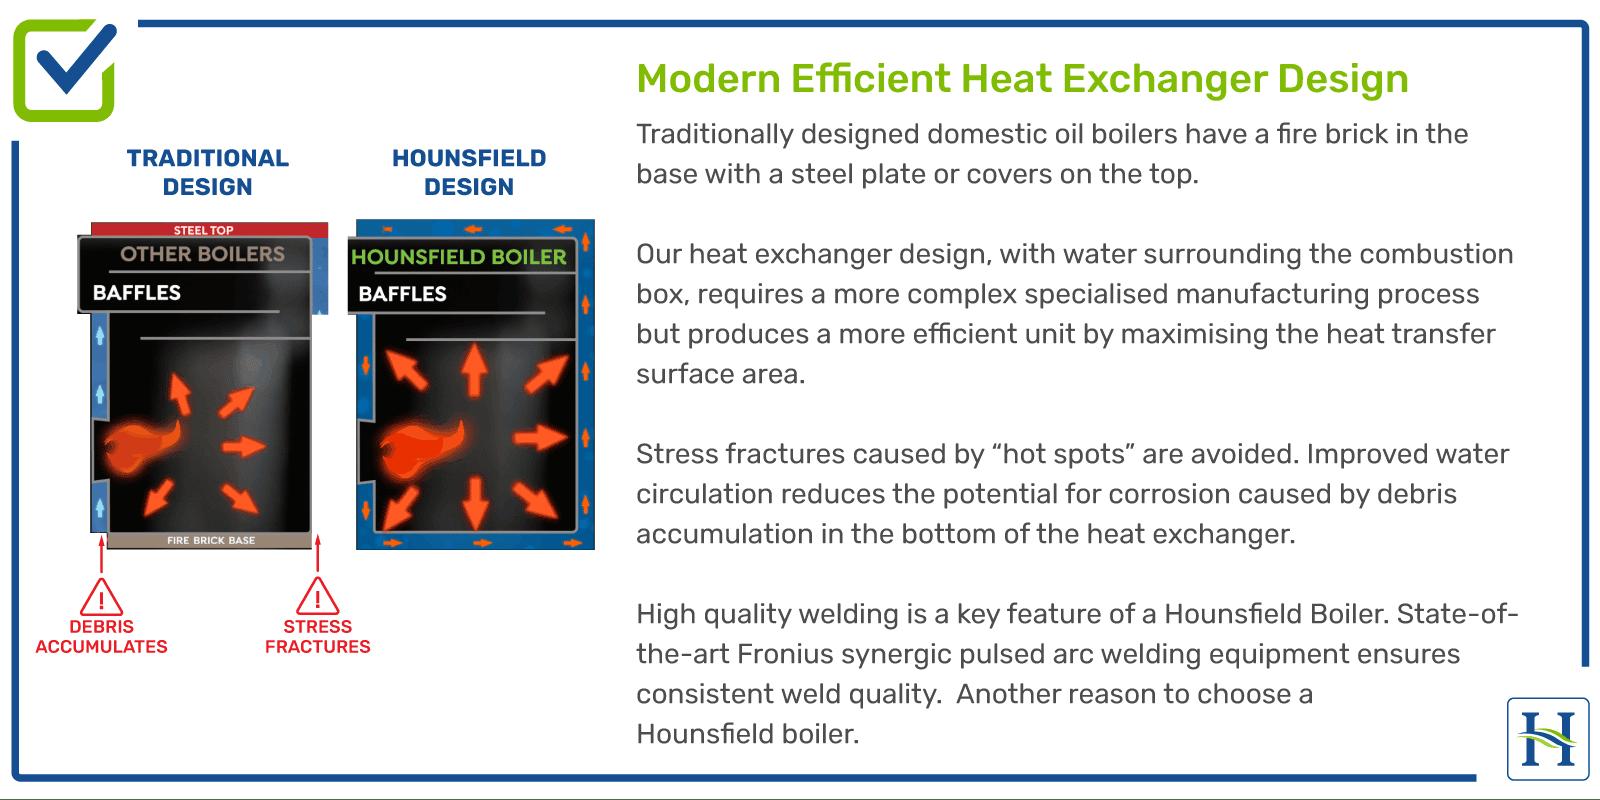 Modern Efficient Heat Exchanger Design for Boiler